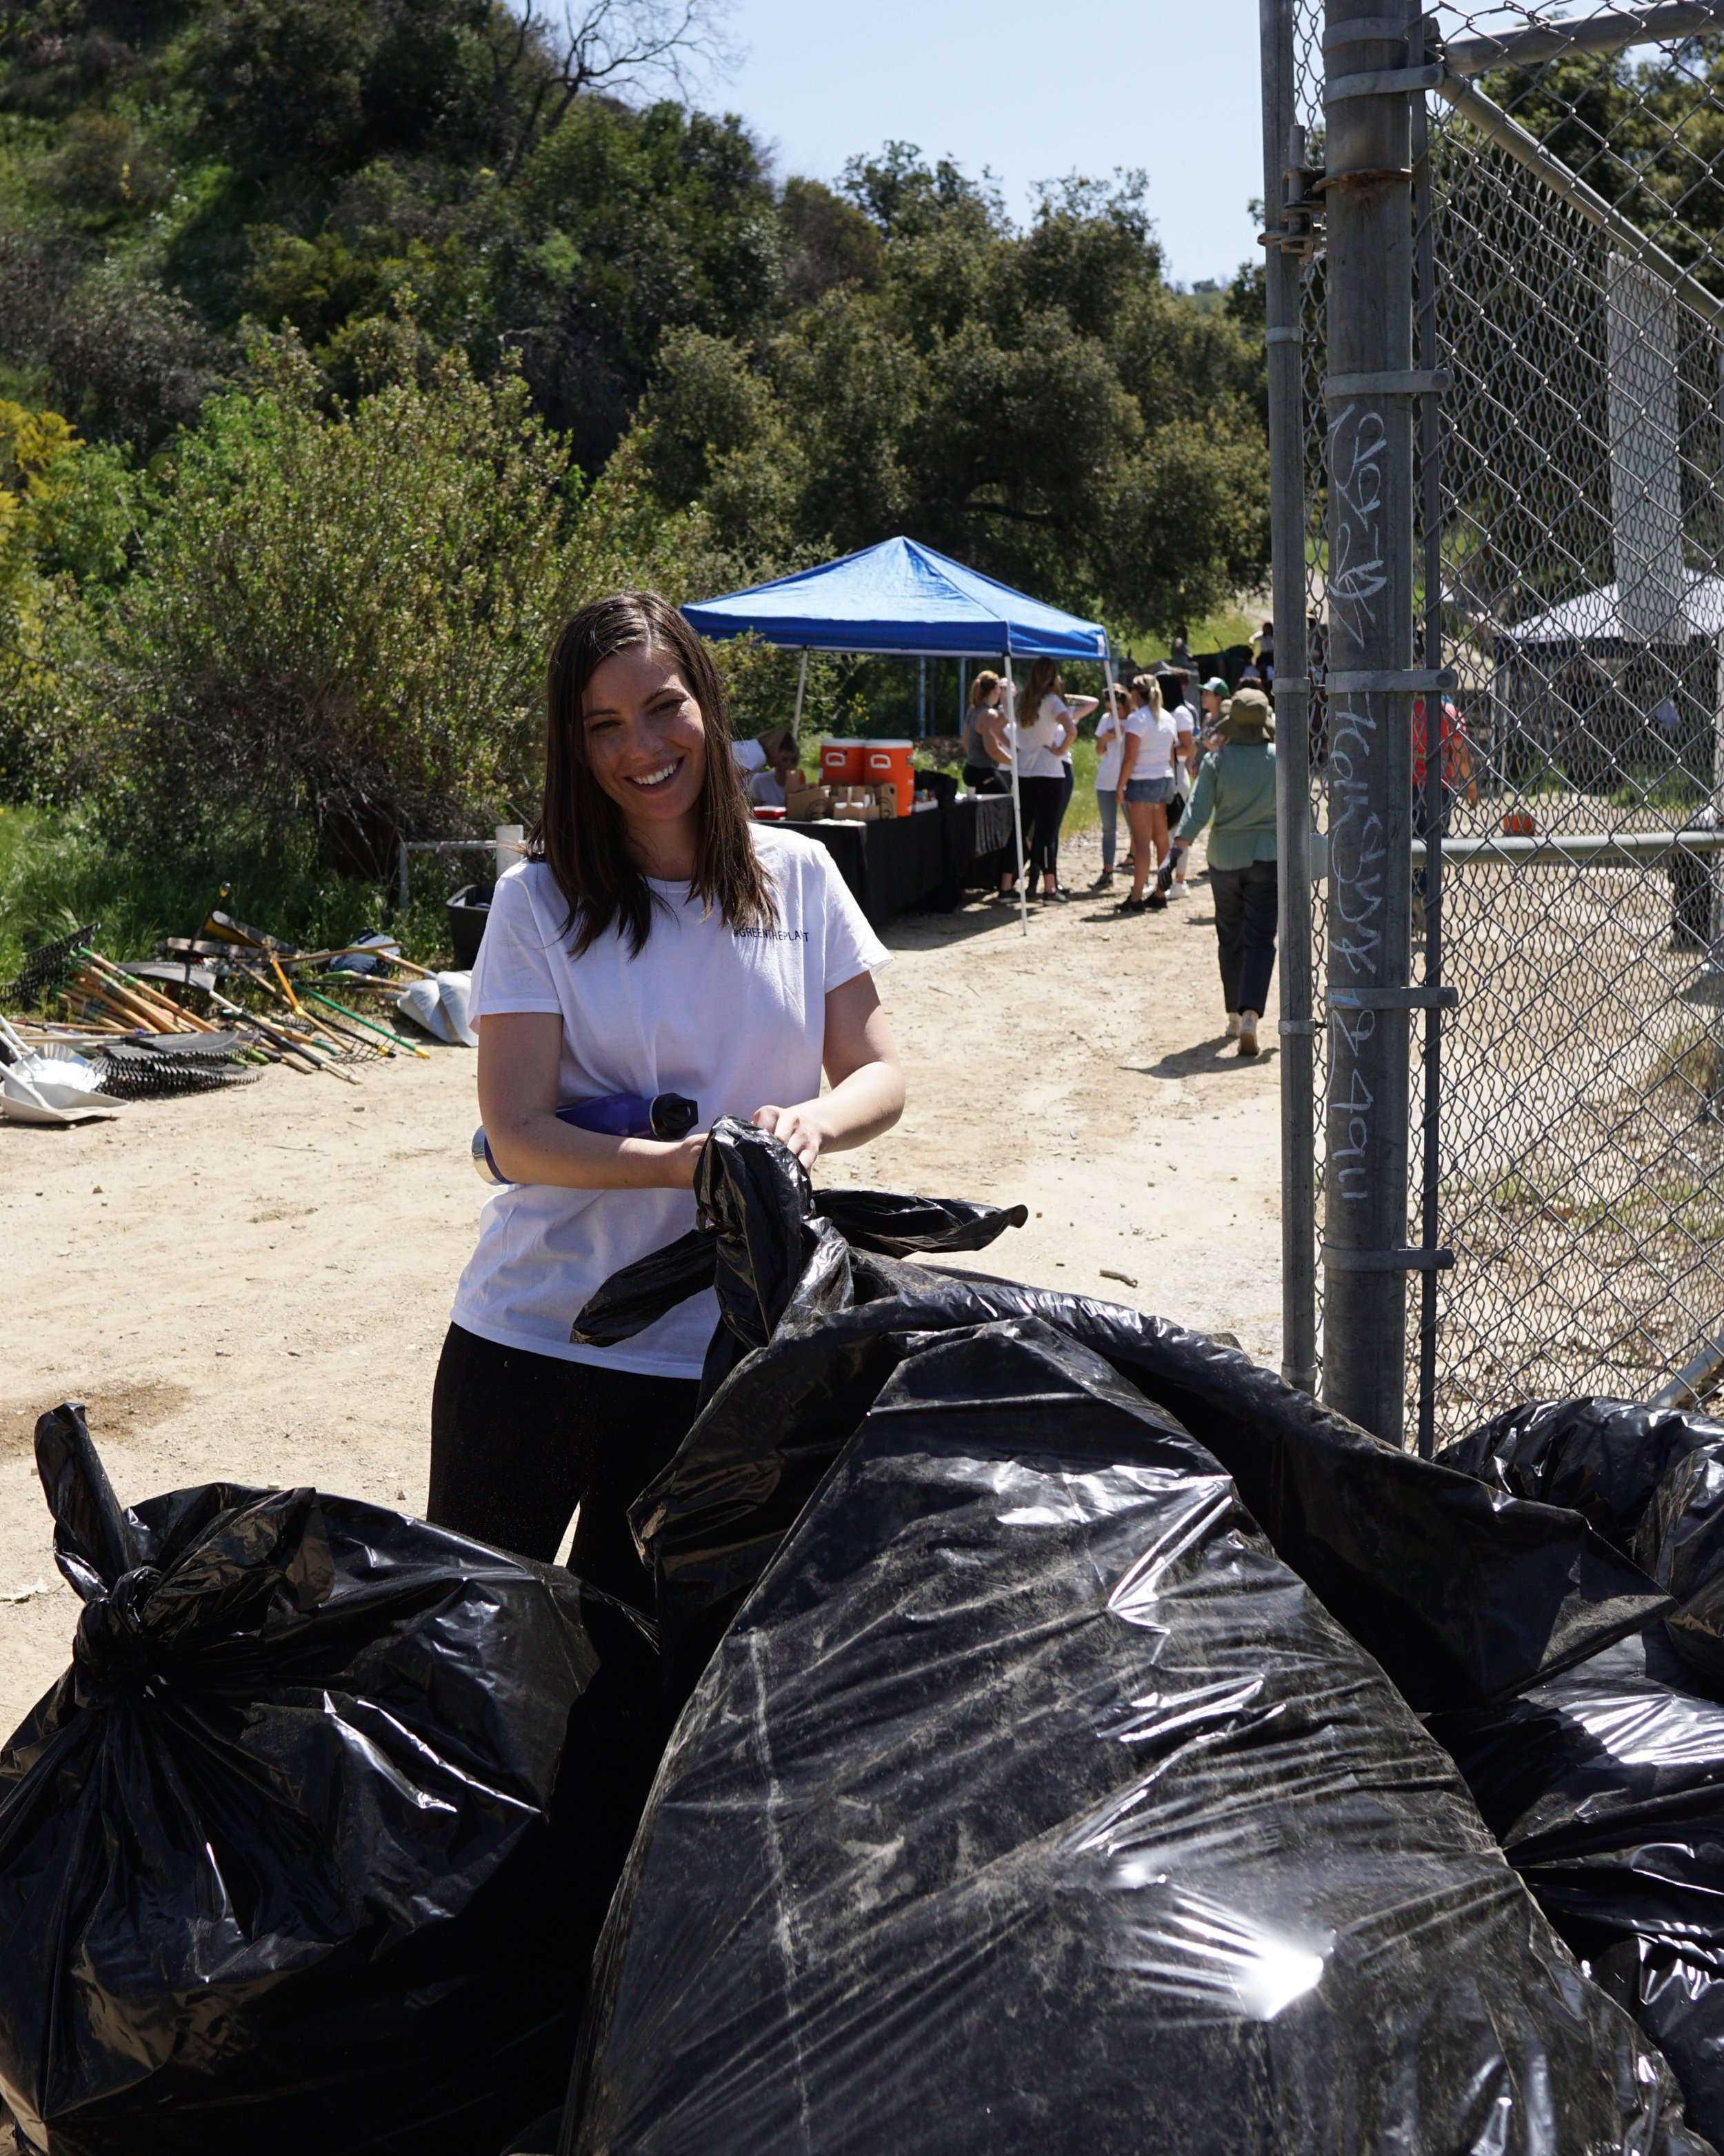 10 Zero Waste Tips for Beginners from www.goingzerowaste.com #zerowaste #ecofriendly #gogreen #communitycleanup